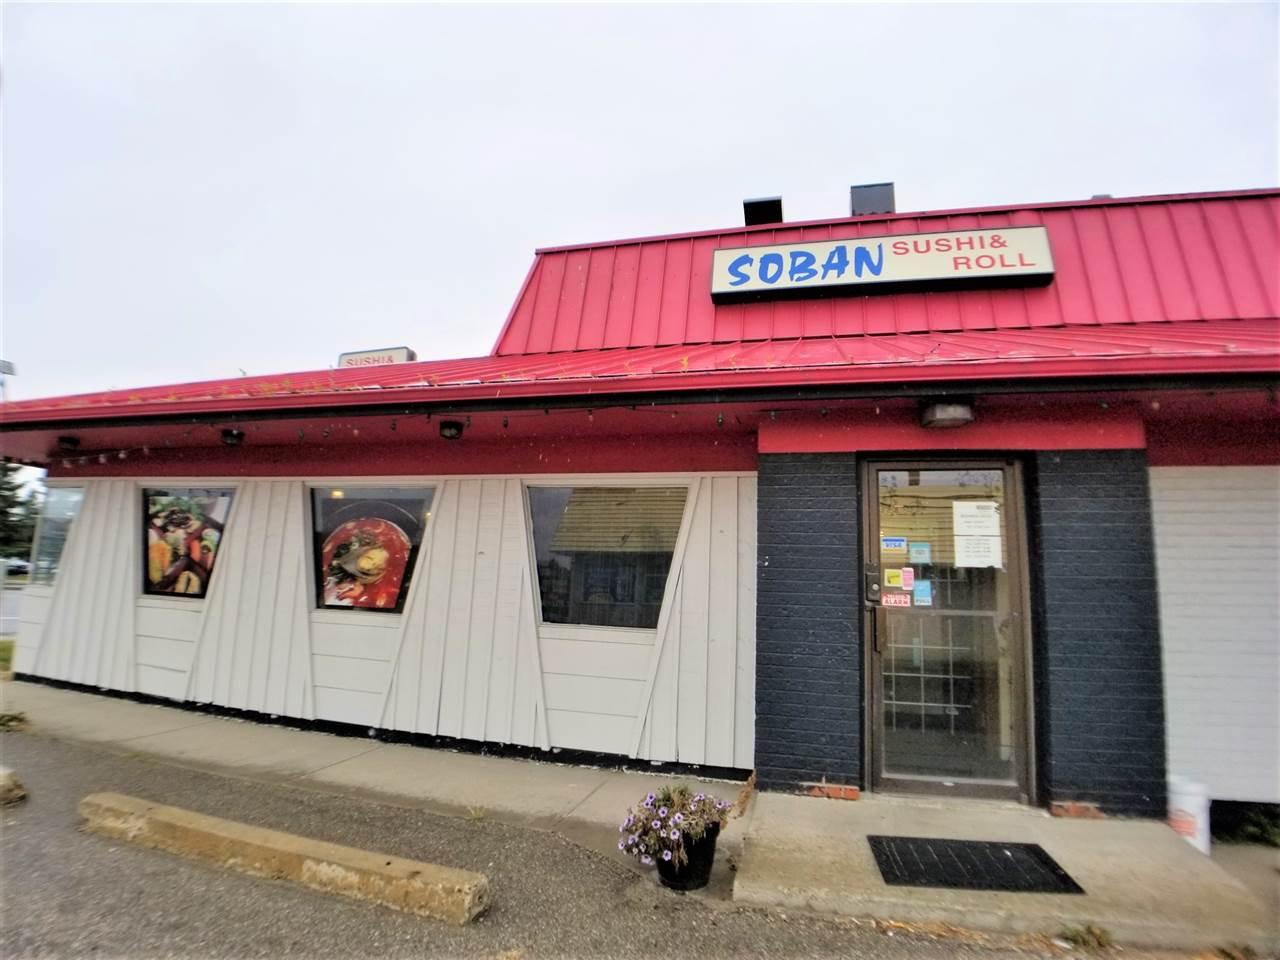 Main Photo: 7450 82 Avenue in Edmonton: Zone 18 Business for sale : MLS®# E4176305